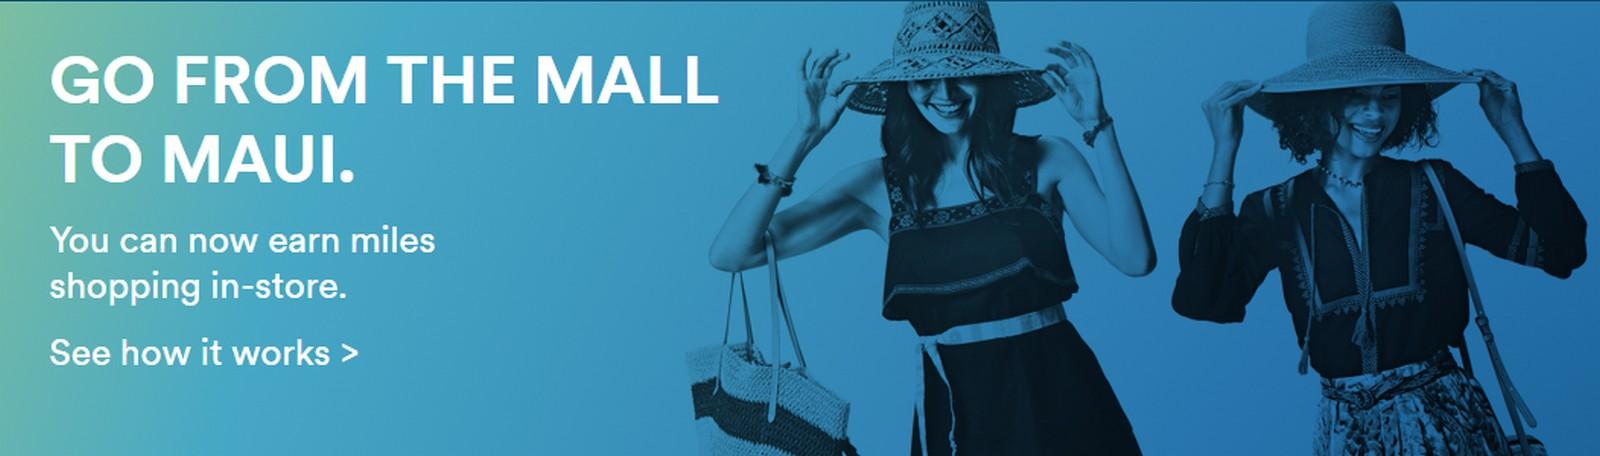 Alaska's Shopping Portal Now Has In-Store Earning